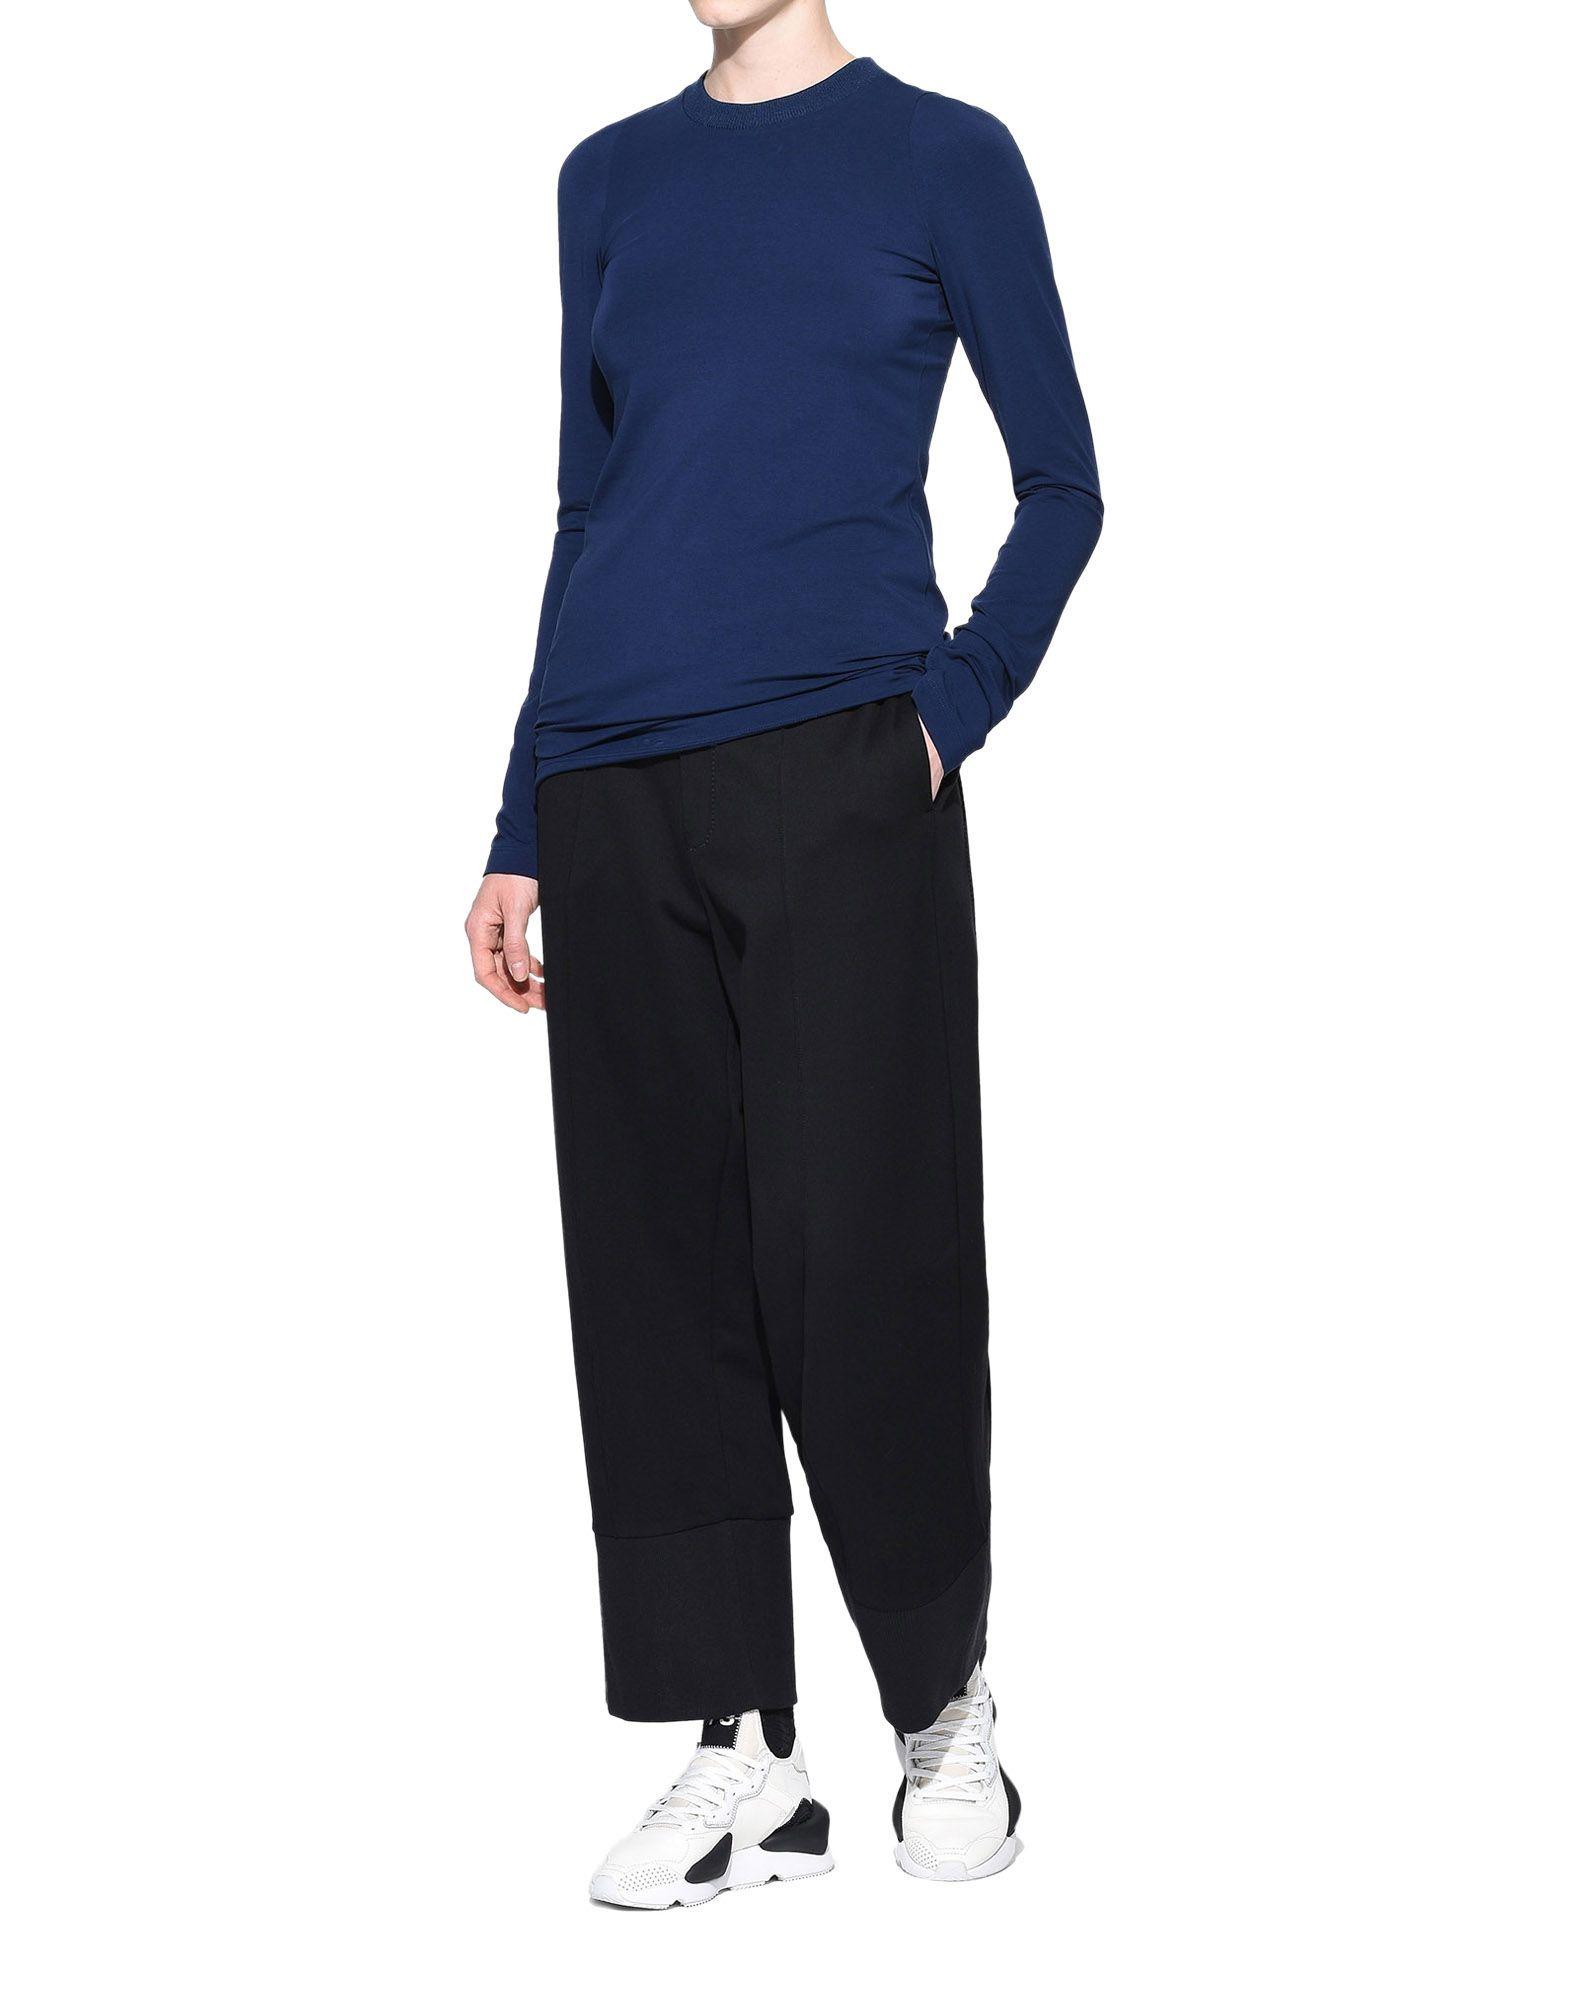 Y-3 Y-3 Prime Tee Long sleeve t-shirt Woman a